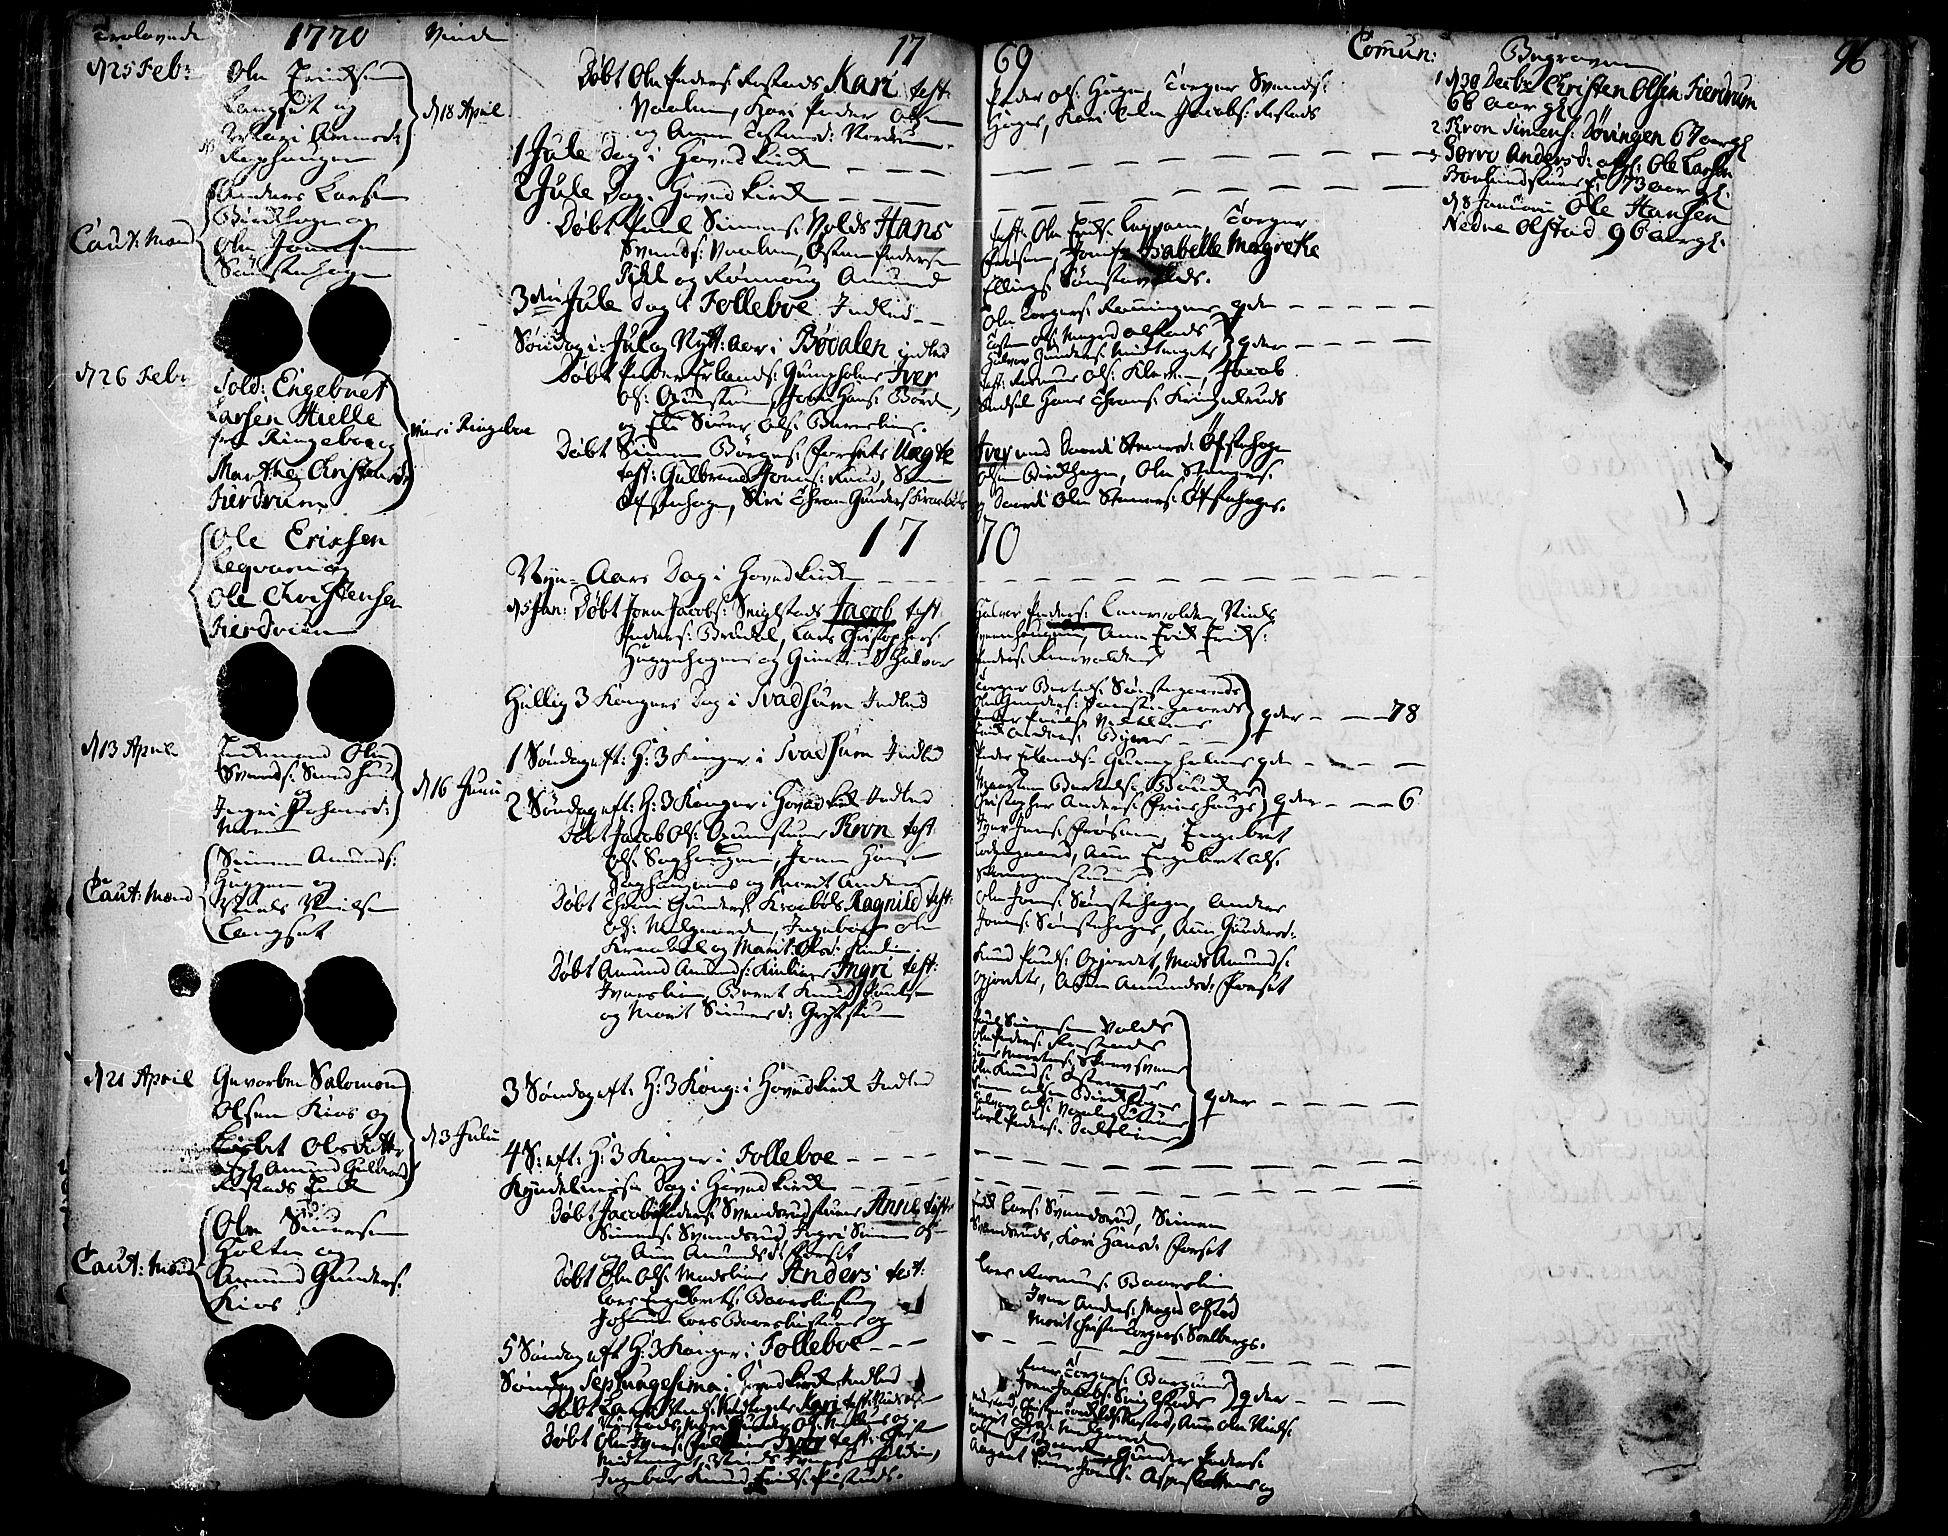 SAH, Gausdal prestekontor, Ministerialbok nr. 3, 1758-1809, s. 96